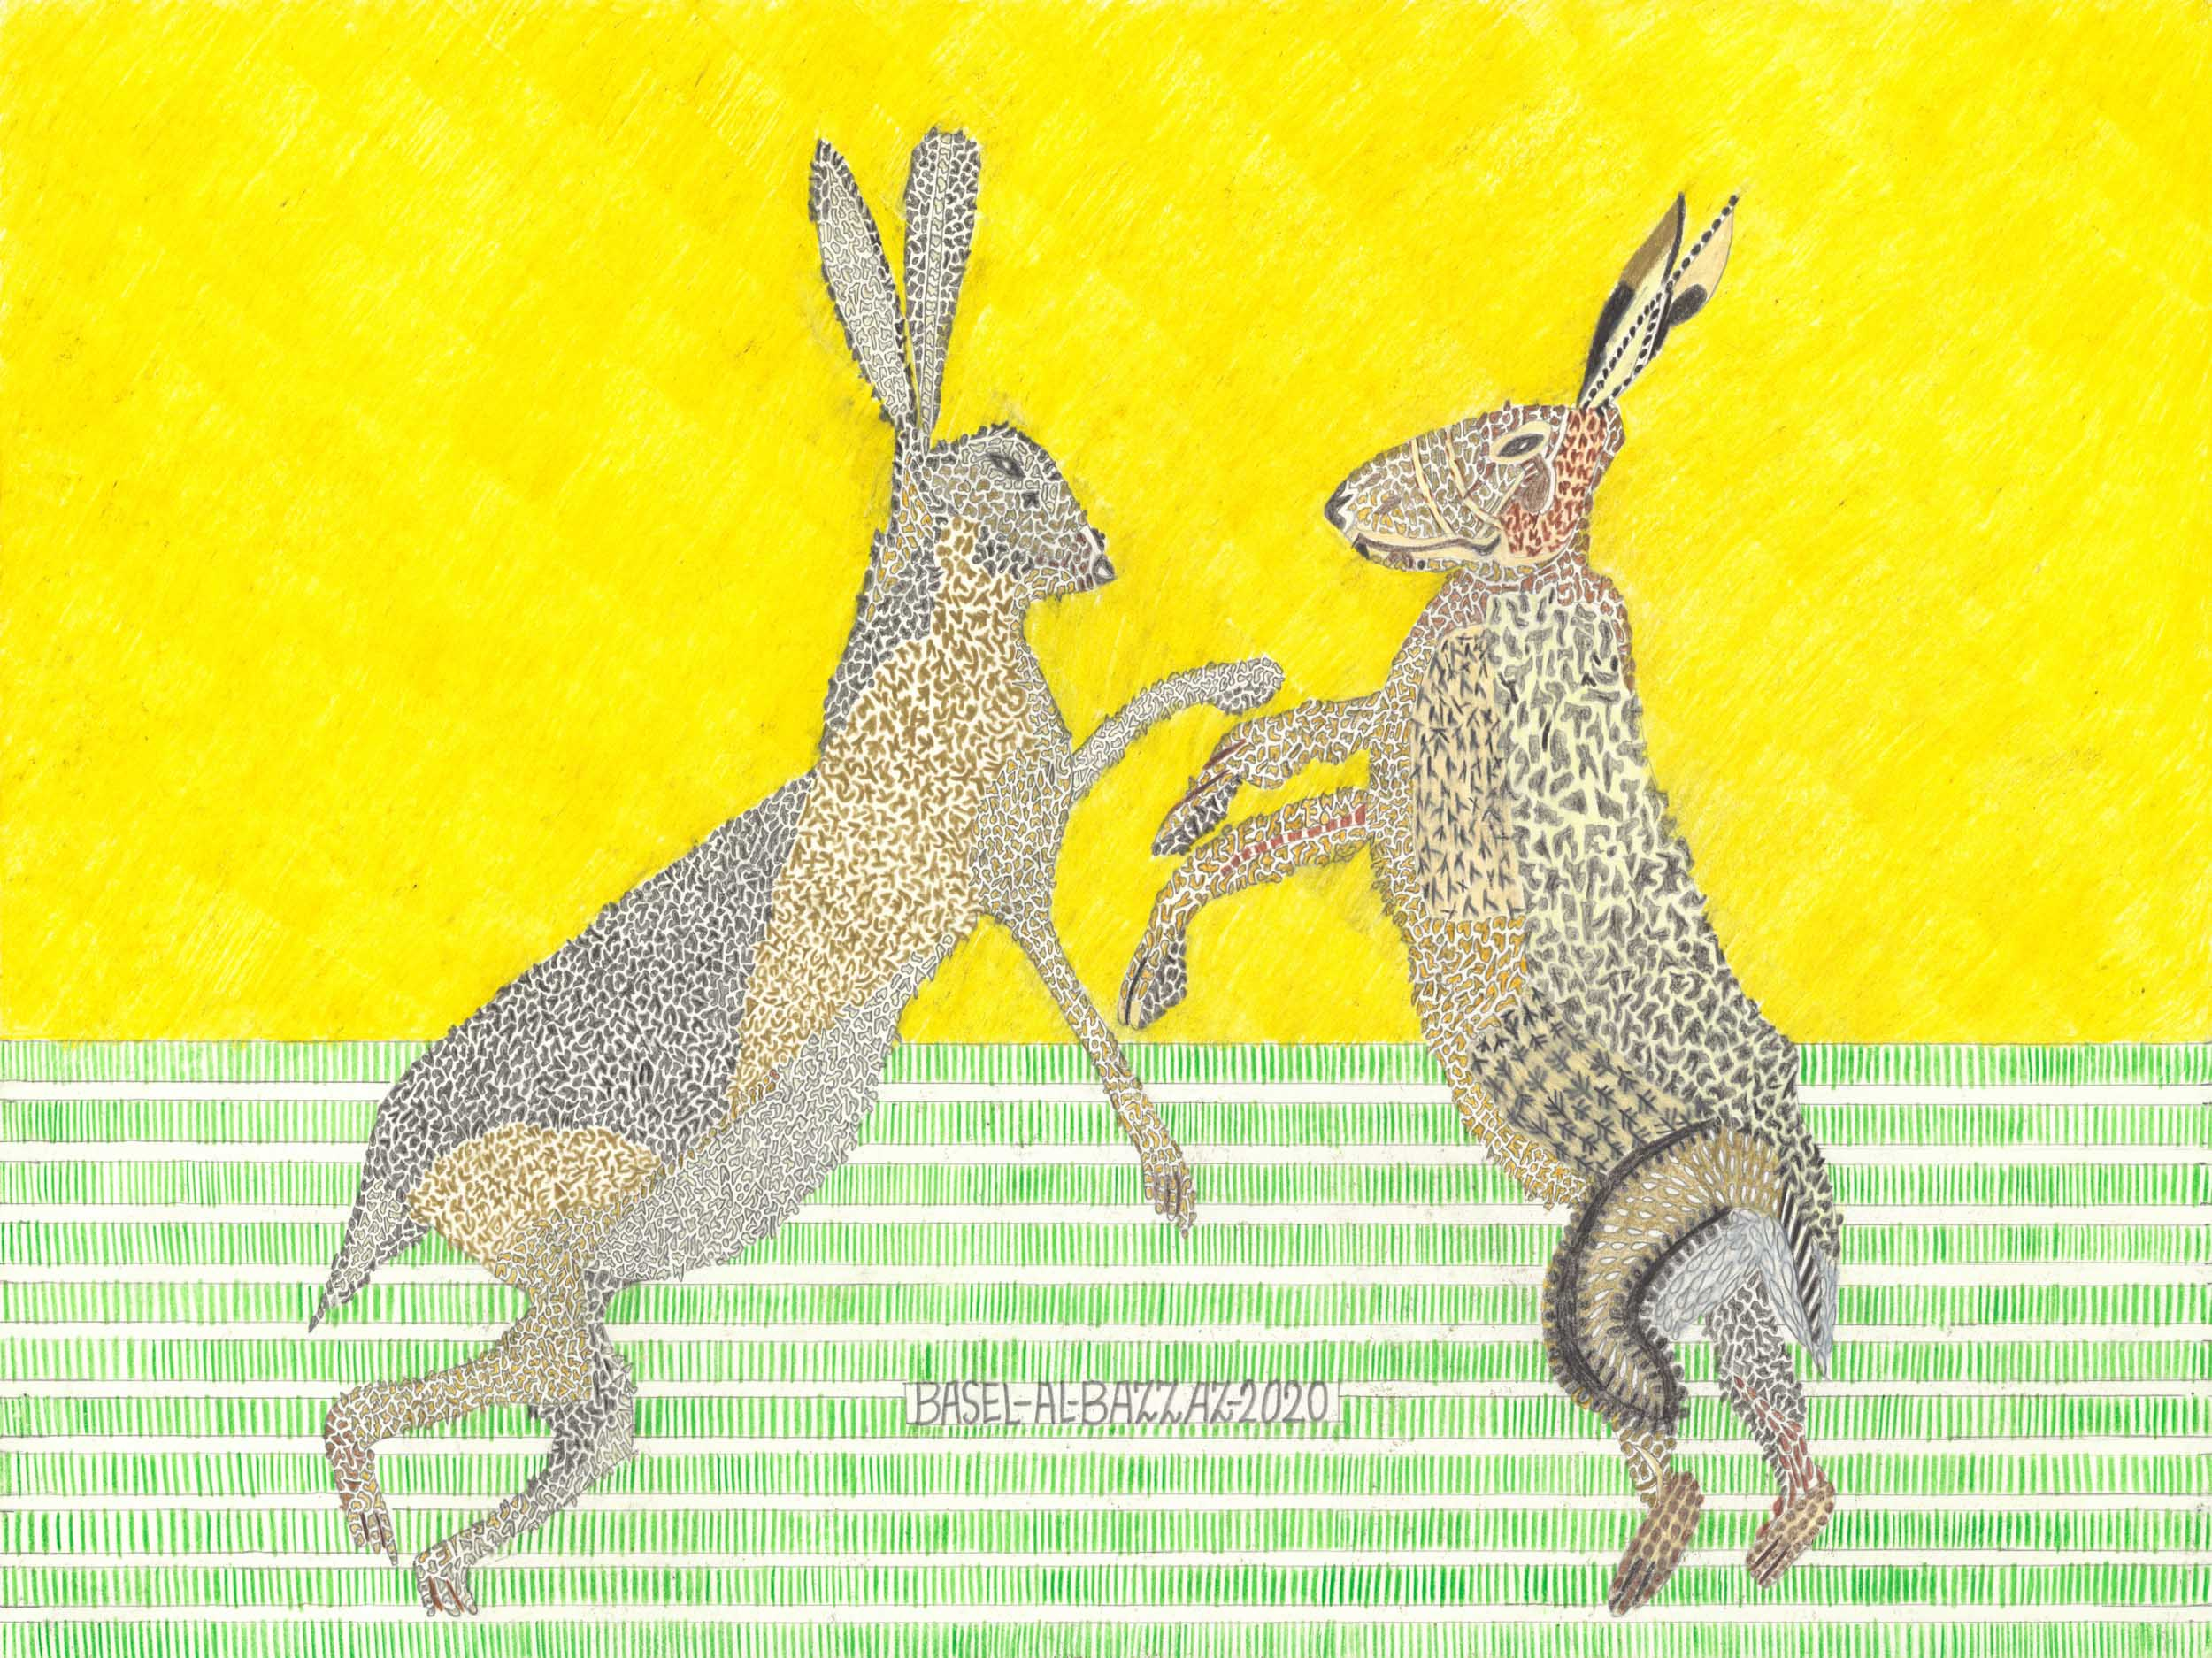 al-bazzaz basel - Hasentanz / Hare dance